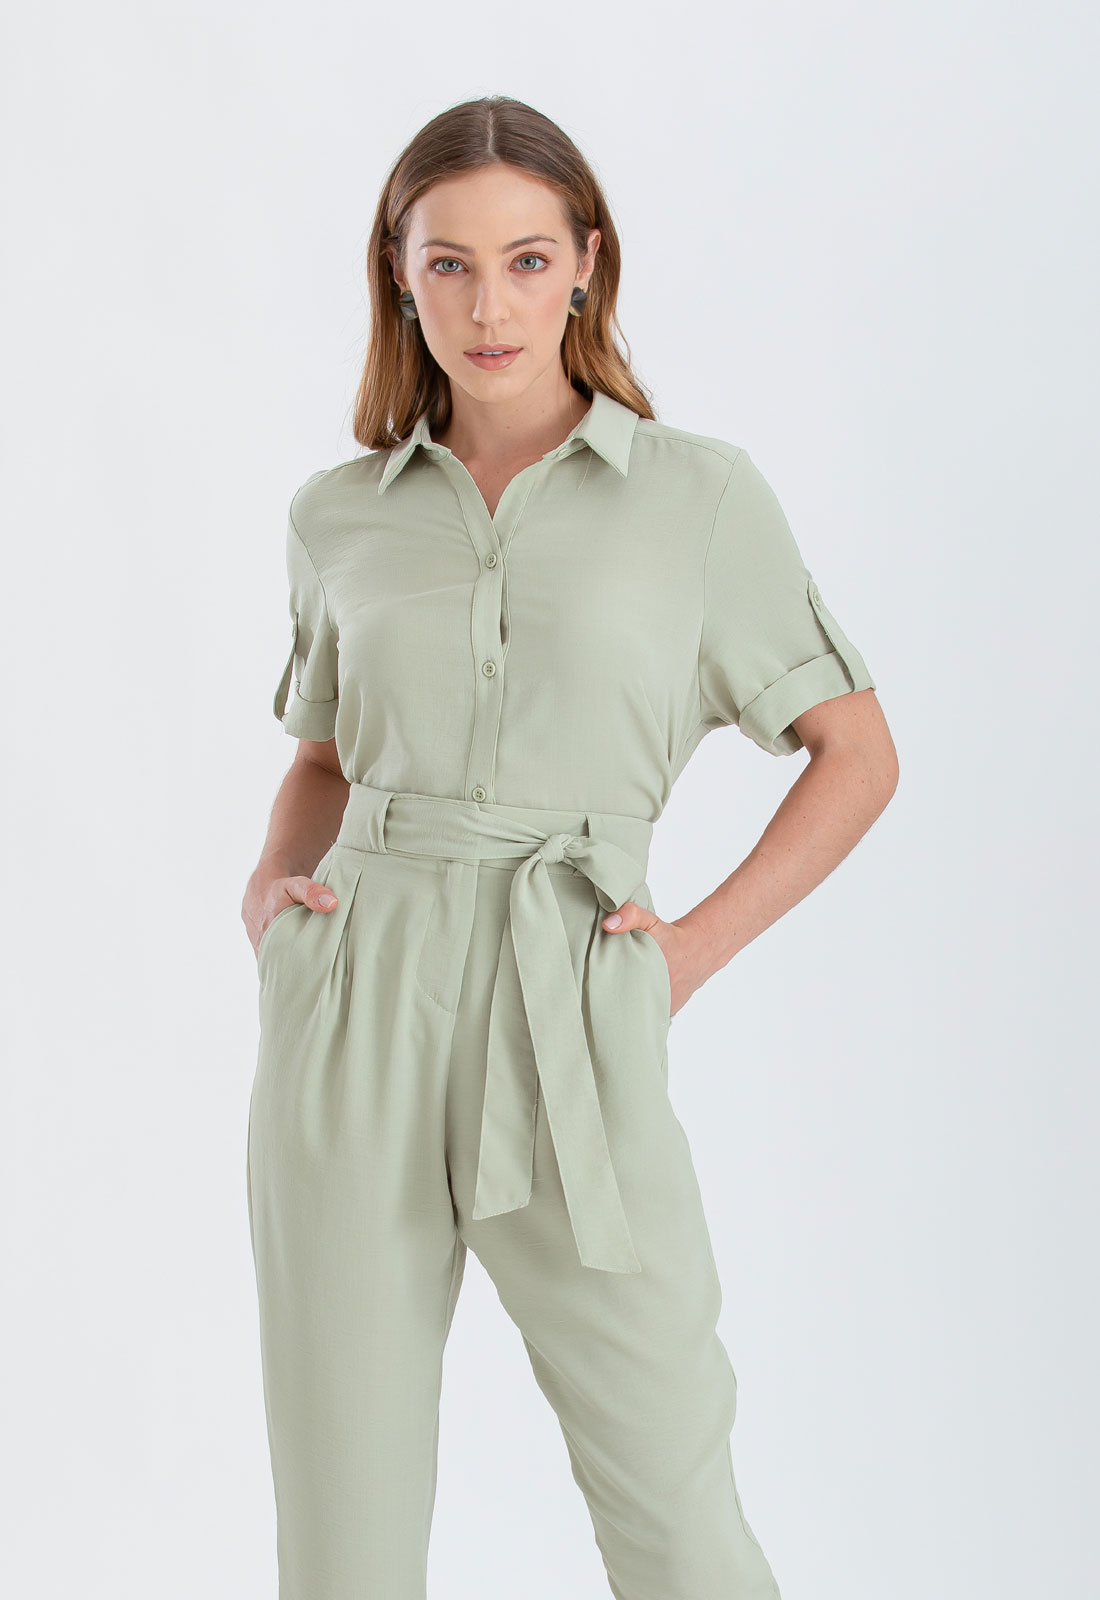 Camisa feminina verde manga curta ref. 2650